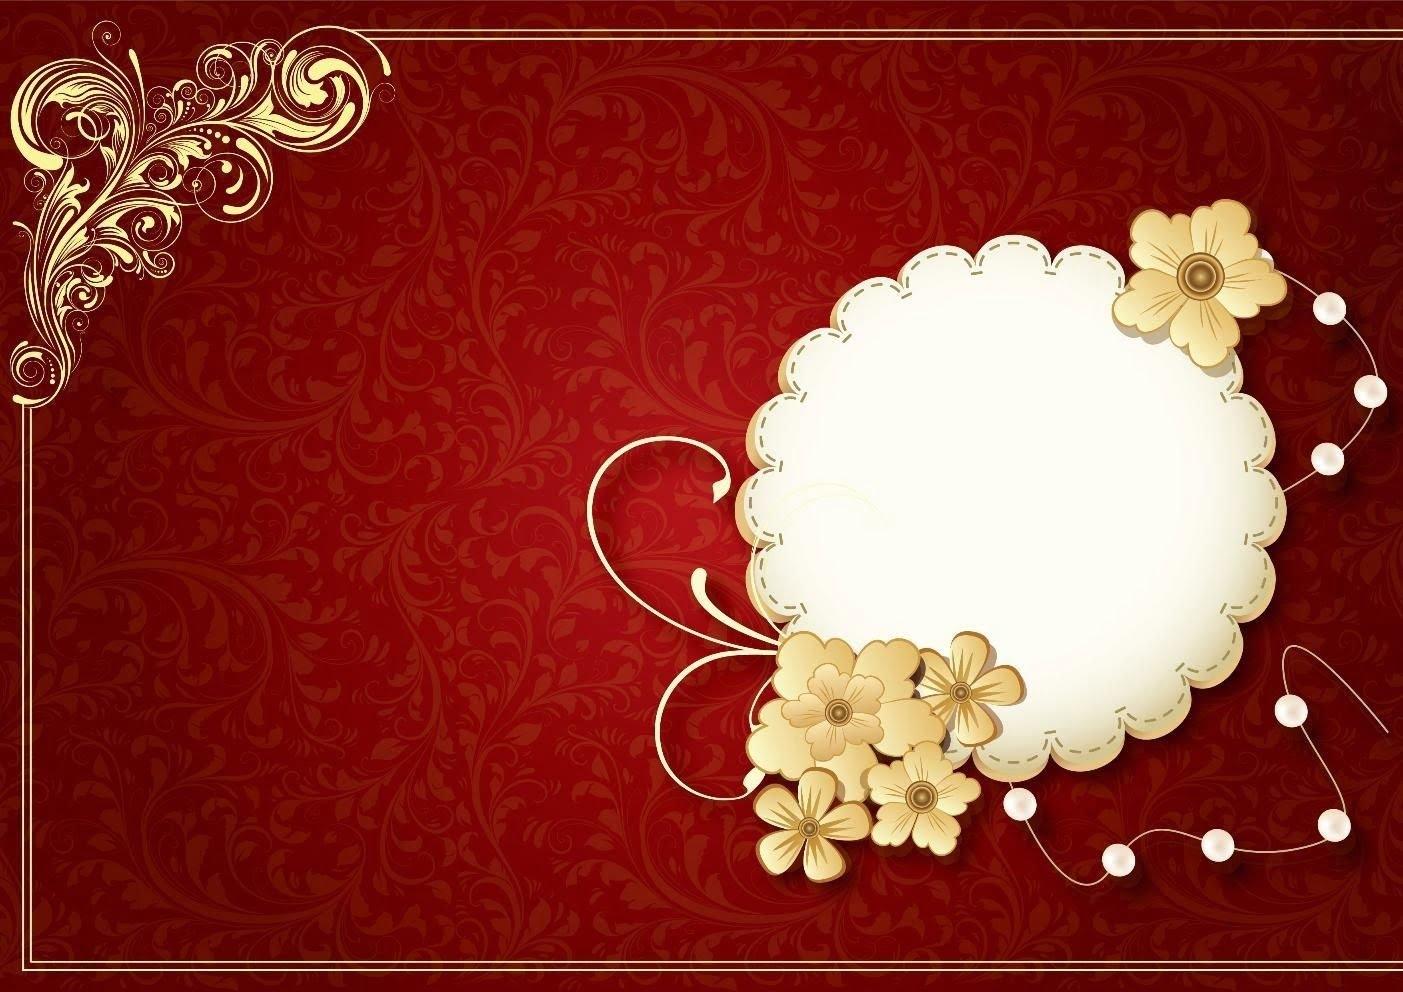 Wedding Invitation Cards Design Blank Marriage Invitation Card